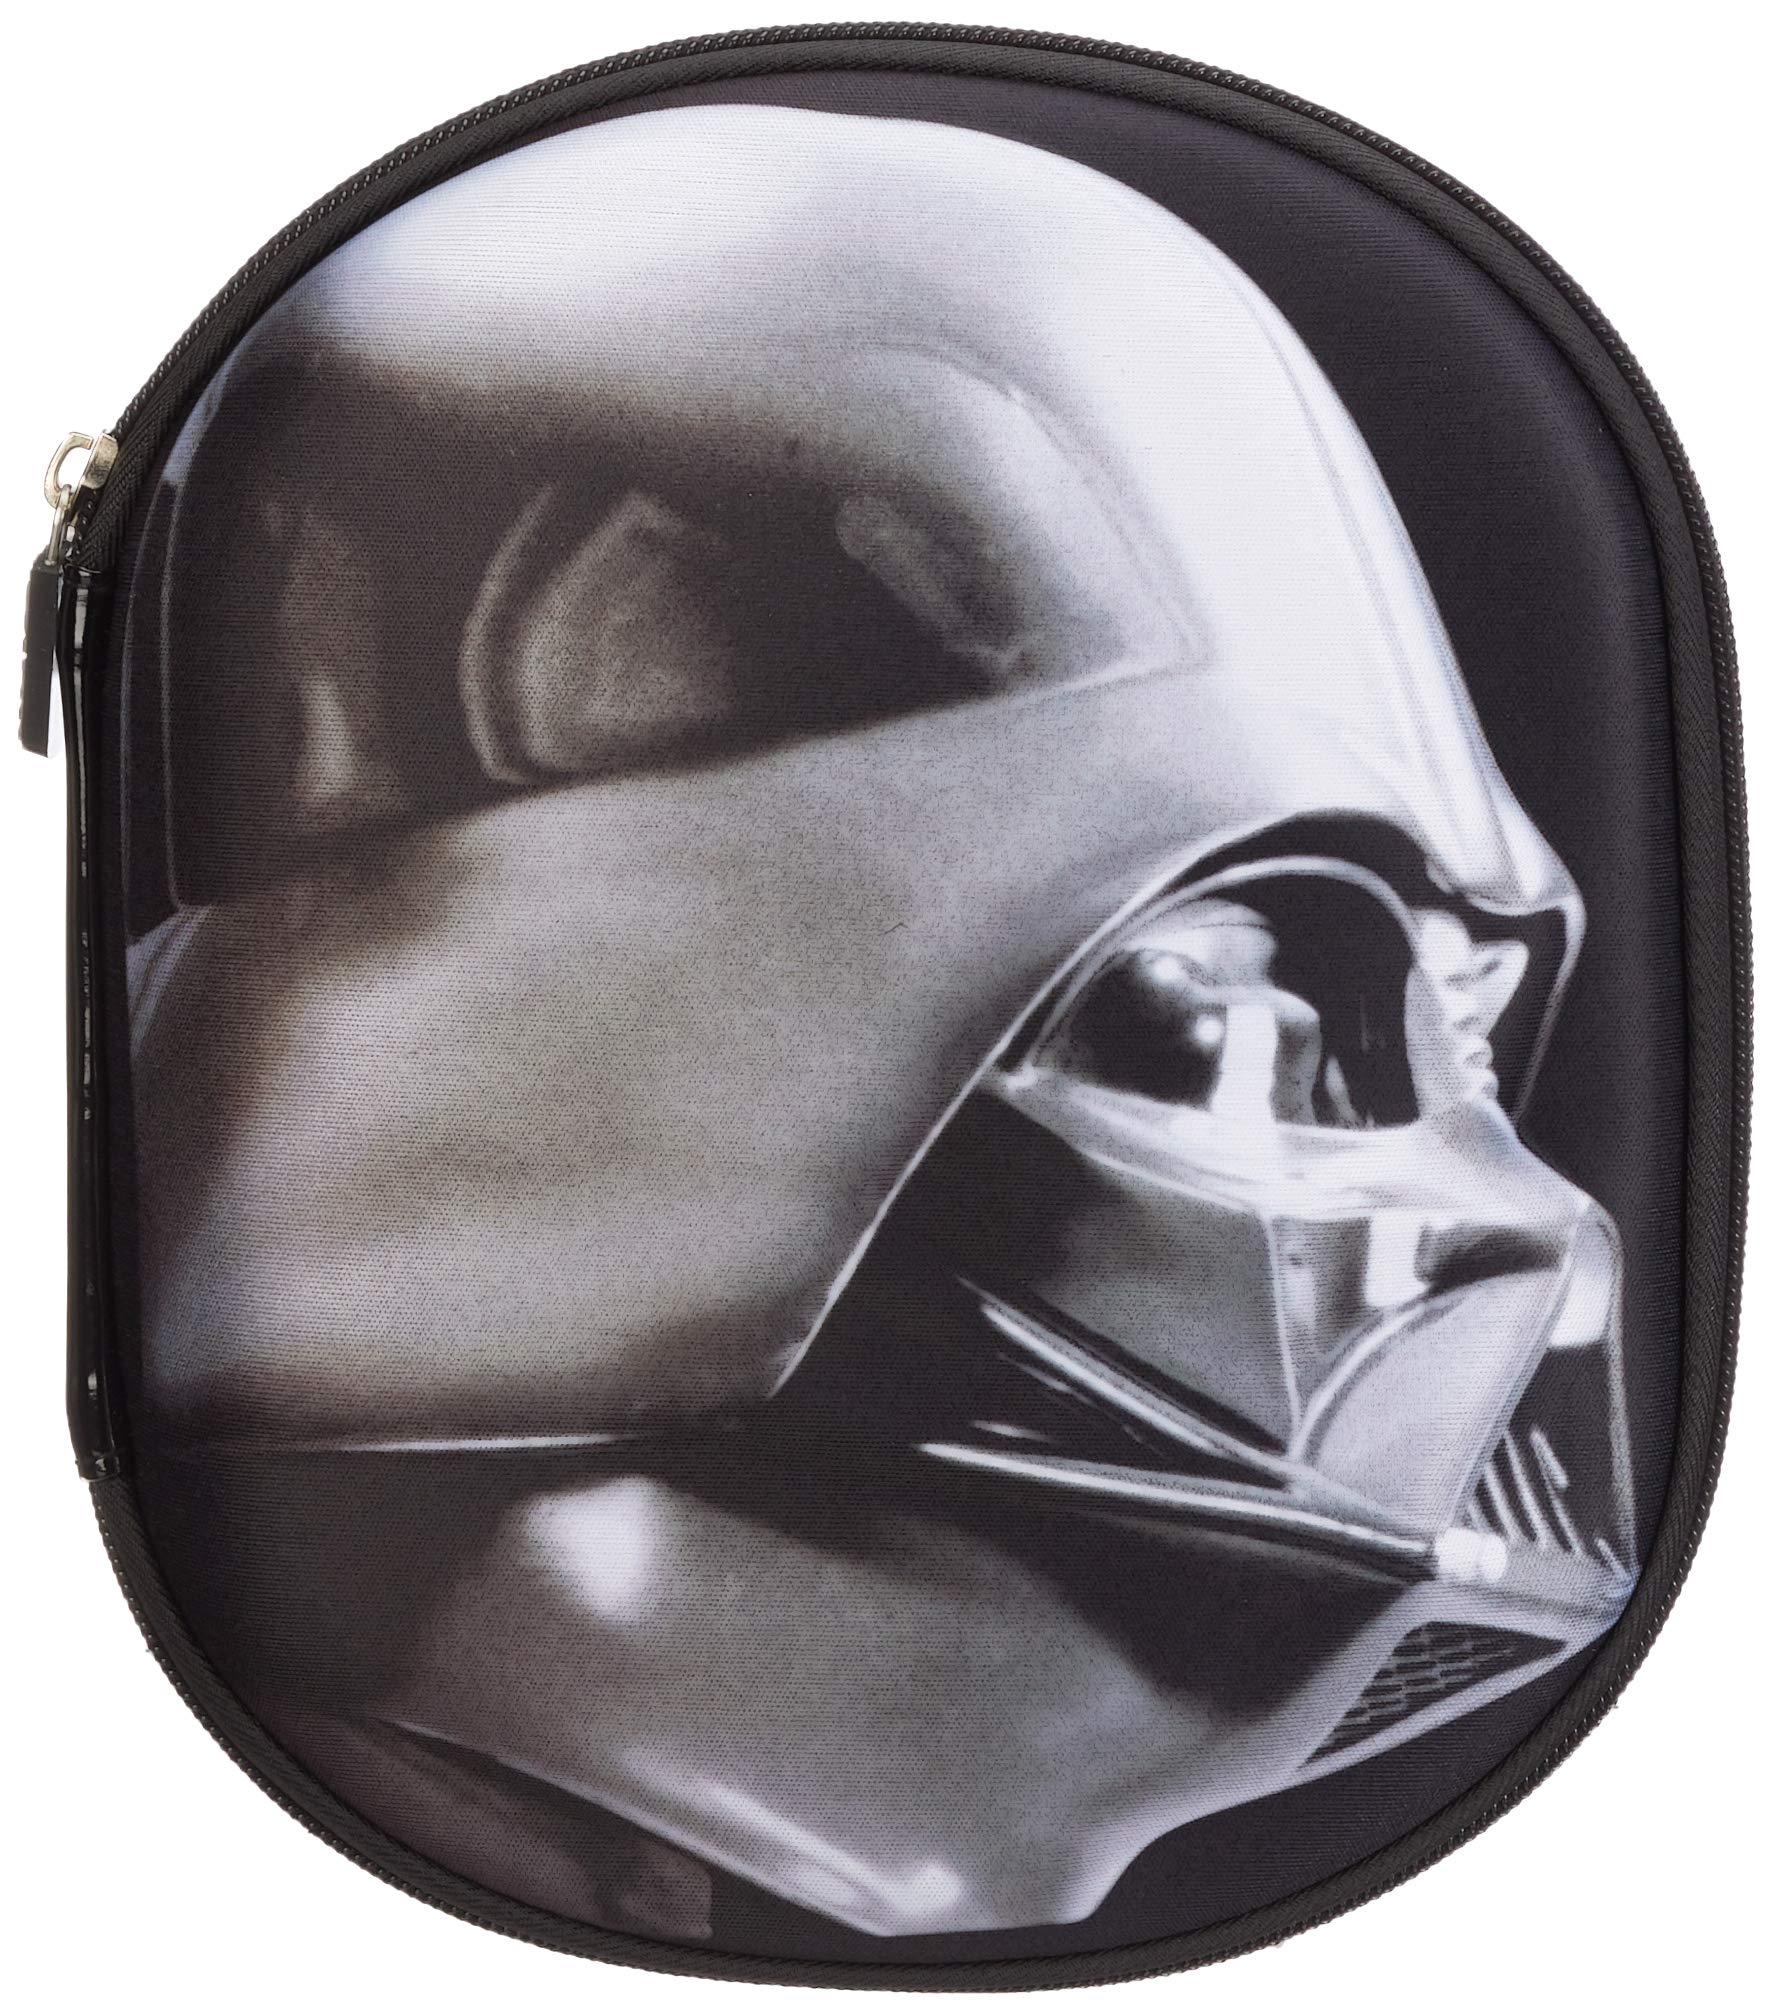 Star Wars-2700000214 Star Wars Plumier, Multicolor, 24 cm (Artesanía Cerdá CD-27-0214)